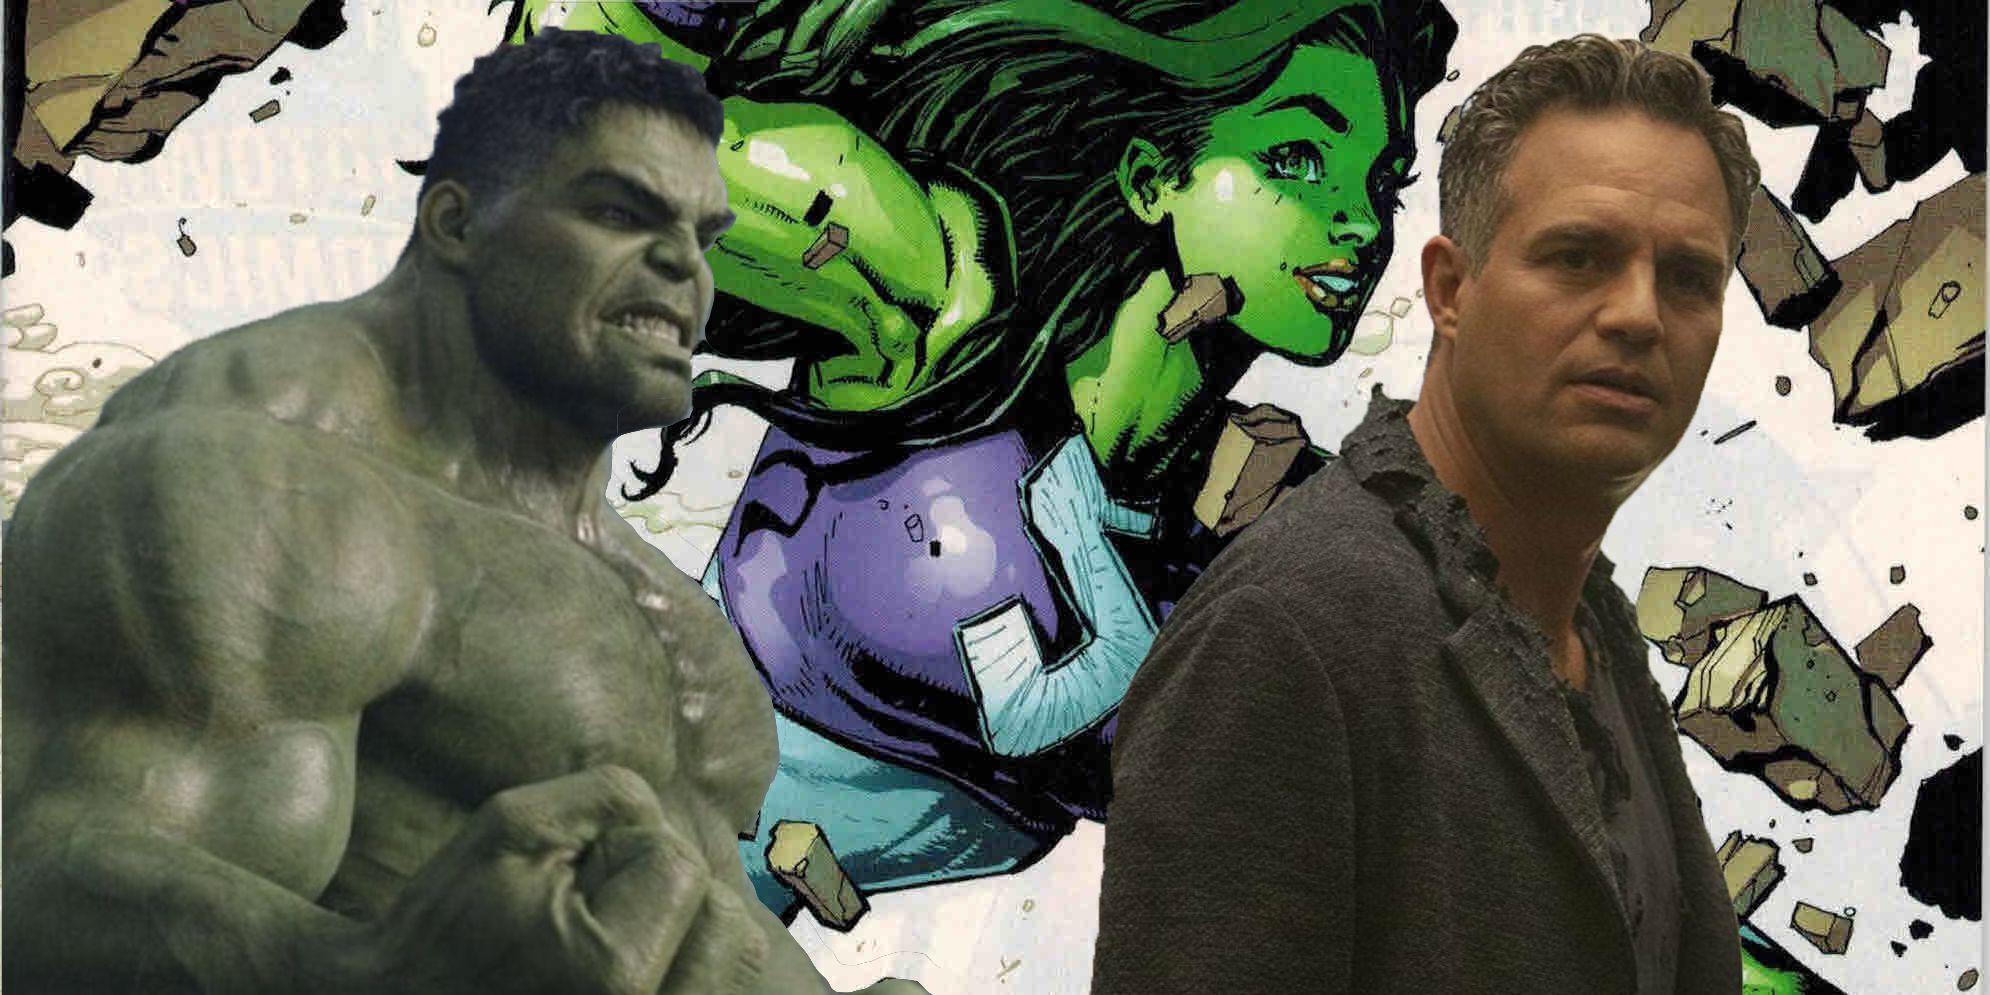 Hulk กลายเป็น Bruce Banner ใน She-Hulk - อธิบายทฤษฎี